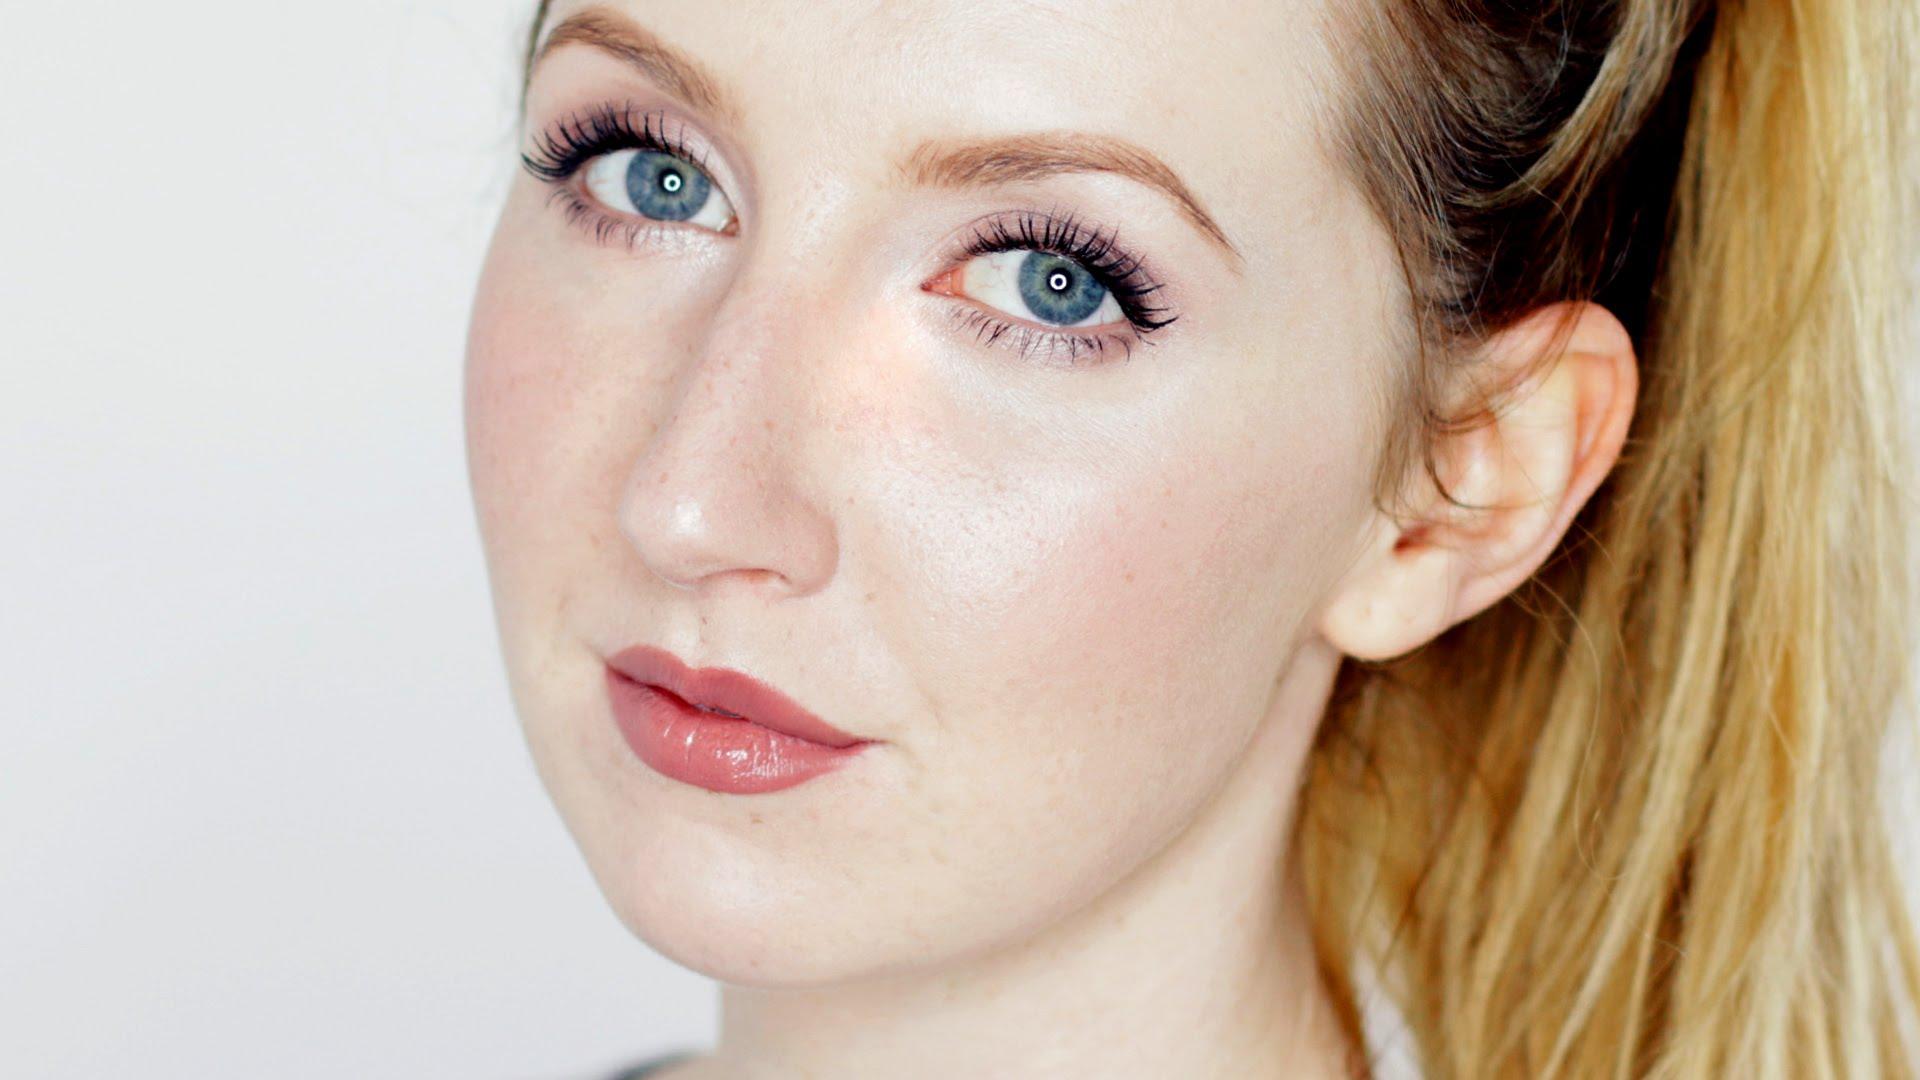 atural Makeup Look For Fair Skin | Pale Skin Beauty Photos Makeup Tutorial for FAIR SKIN / Contouring, Nude Lips, Bronze Eyes